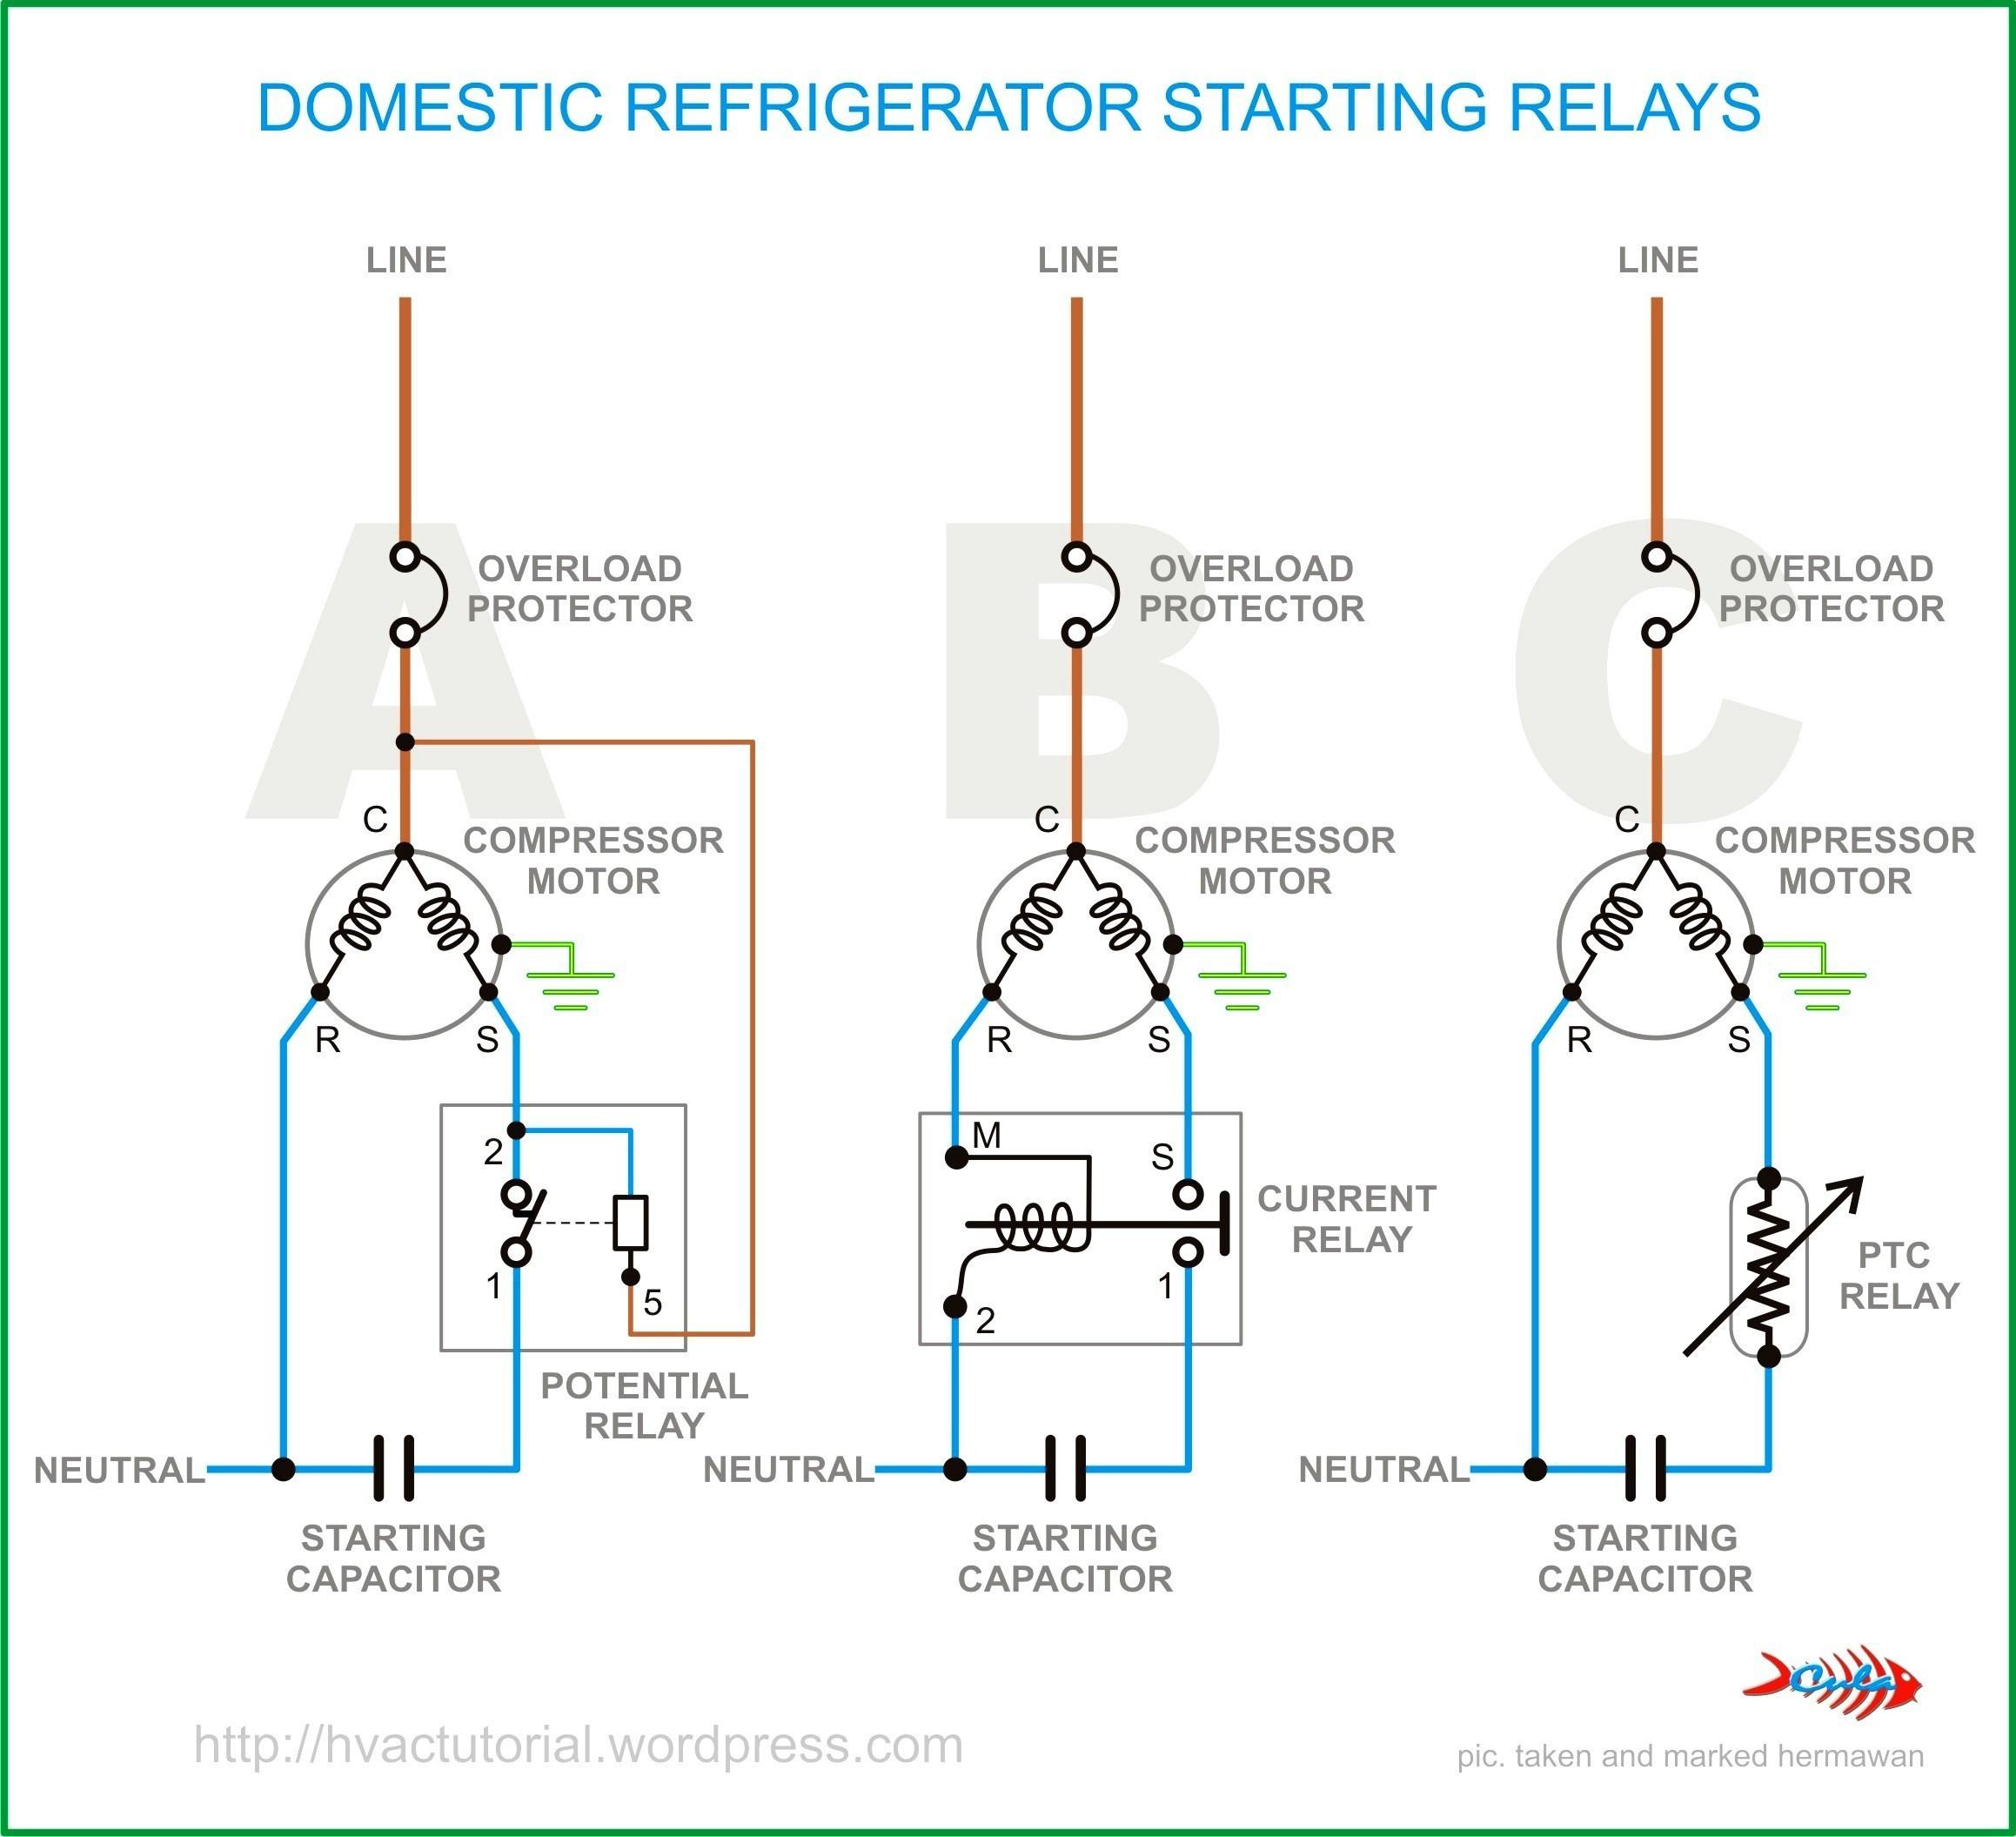 ptc relay wiring diagram wiring diagram library u2022 rh wiringhero today Embraco pressor Relay Embraco pressor